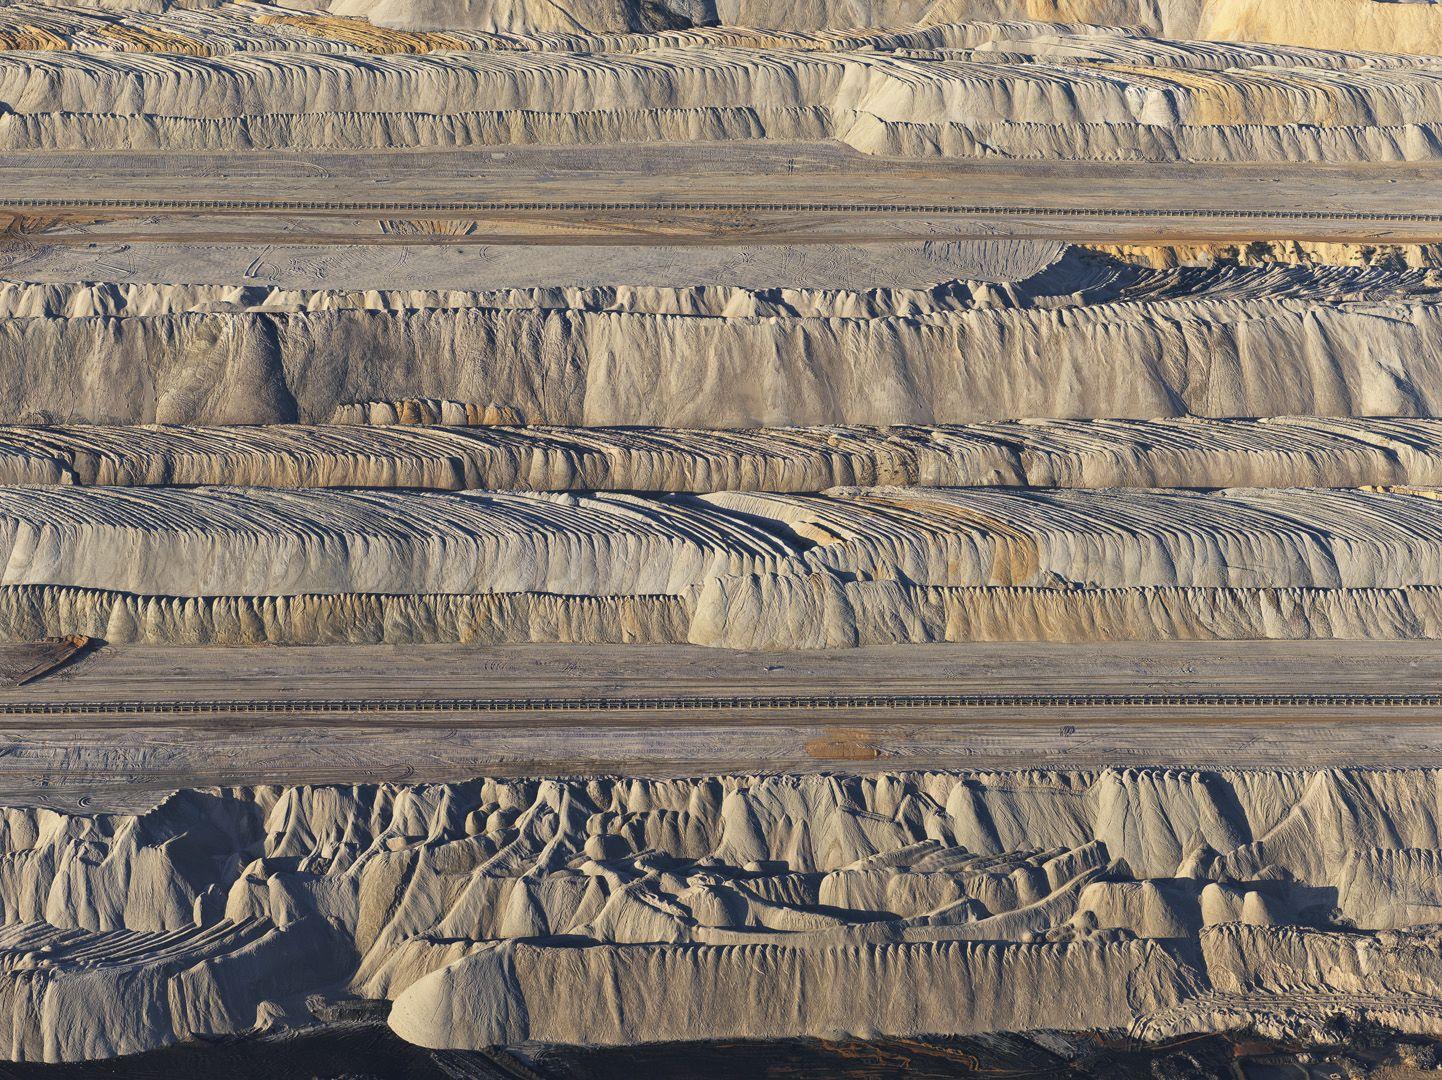 Edward Burtynsky - Coal Mine #3, North Rhine, Westphalia, Germany 1/9, 2015 - Howard Greenberg Gallery - 2018